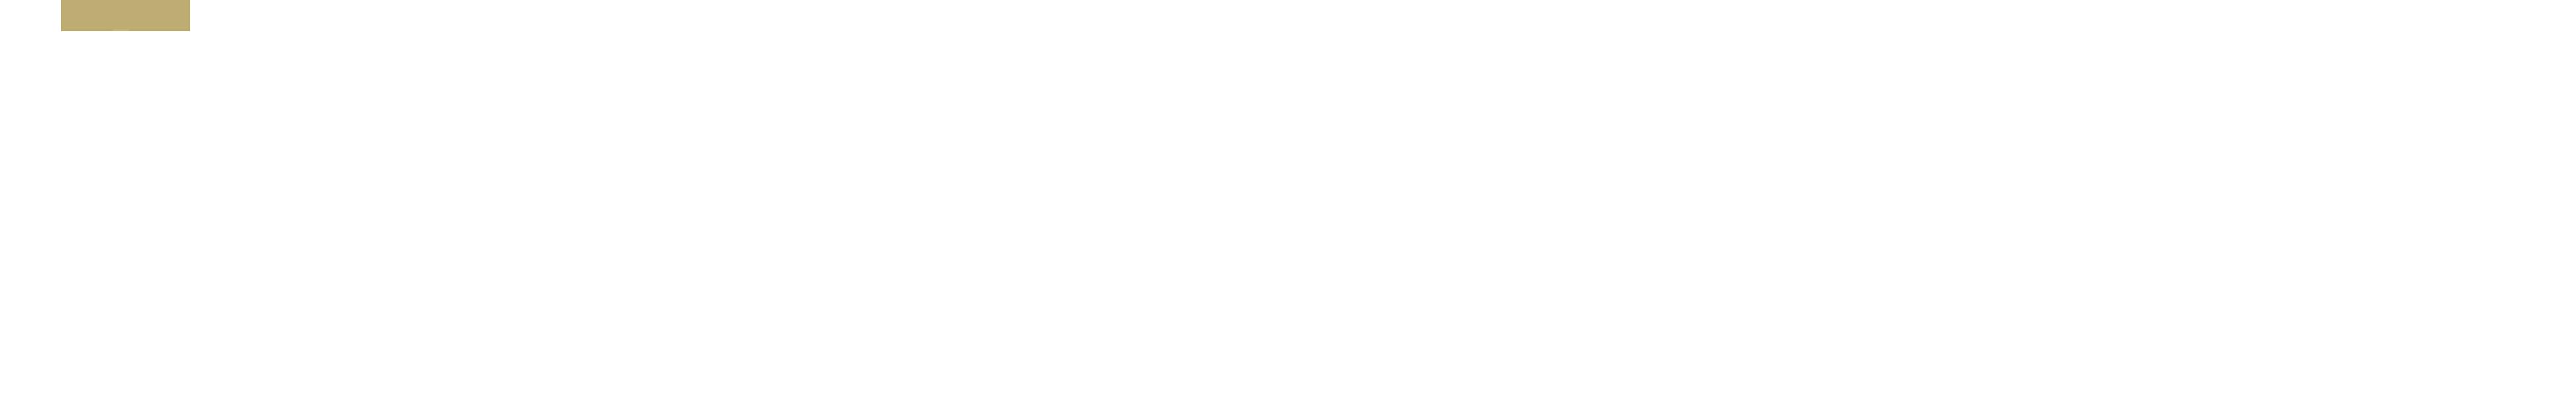 caliph designs logo